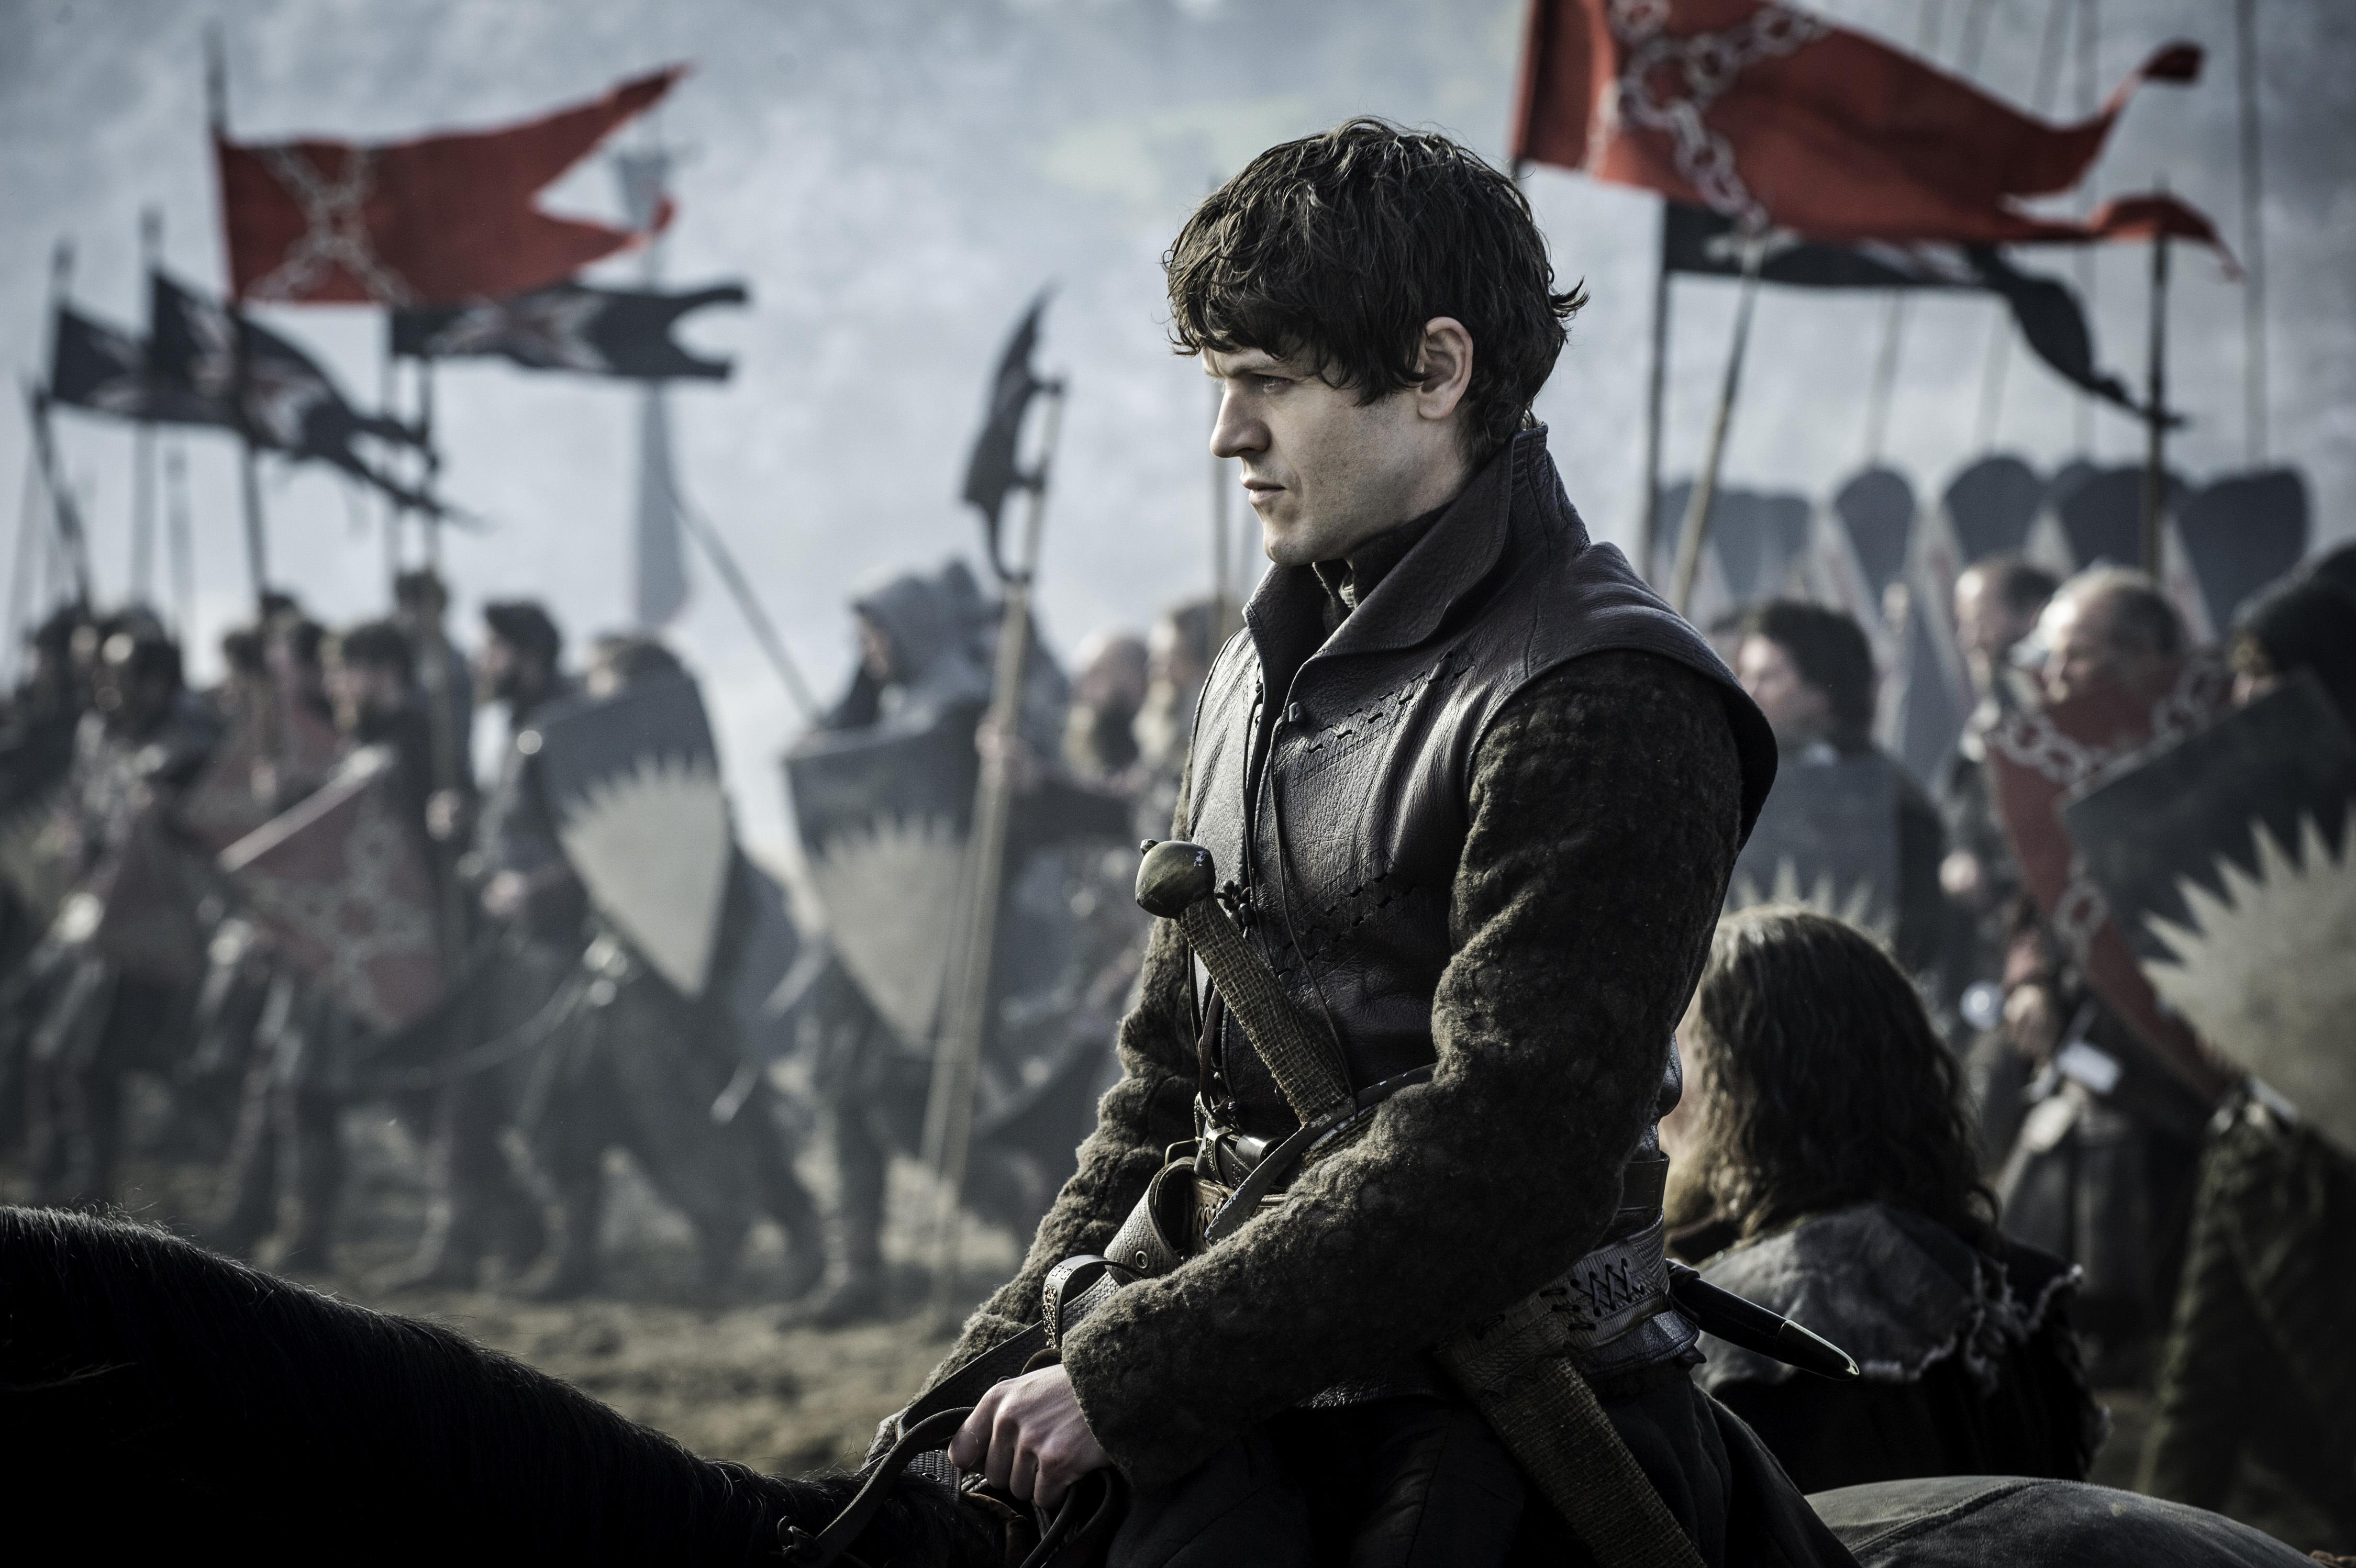 Iwan Rheon in Game of Thrones, season 6, episode 9.